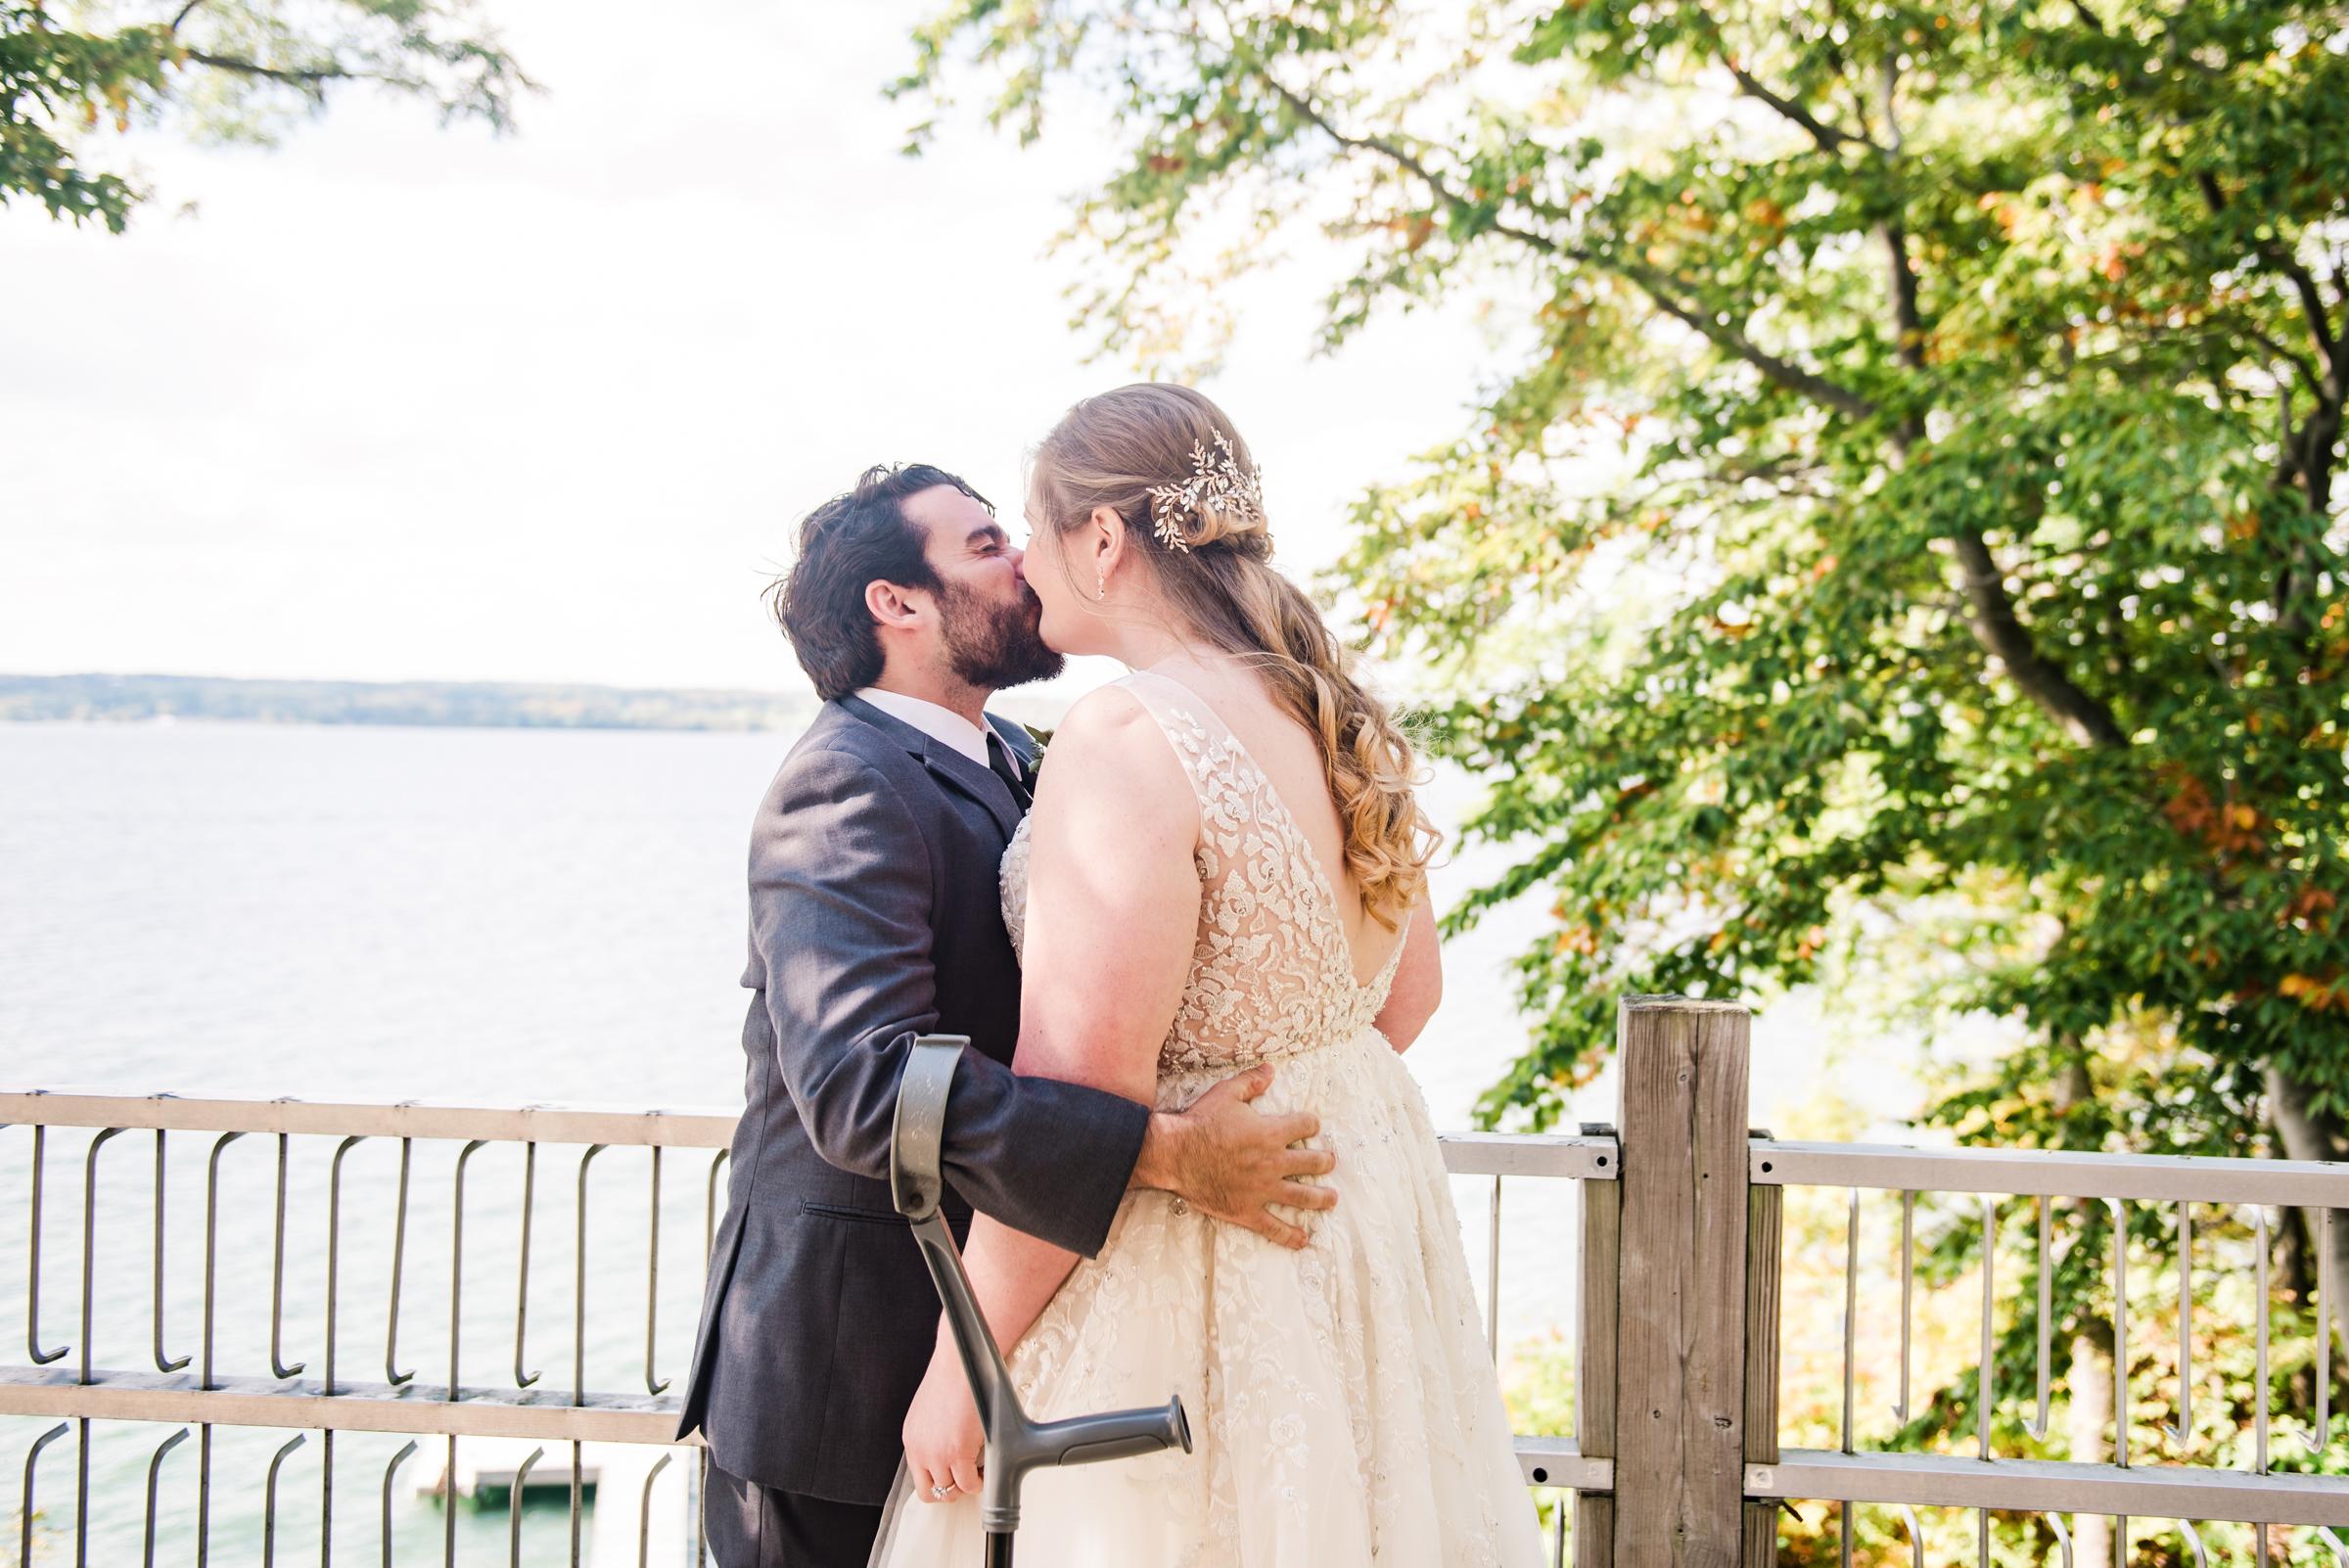 Zugibe_Vineyards_Finger_Lakes_Wedding_JILL_STUDIO_Rochester_NY_Photographer_DSC_3441.jpg